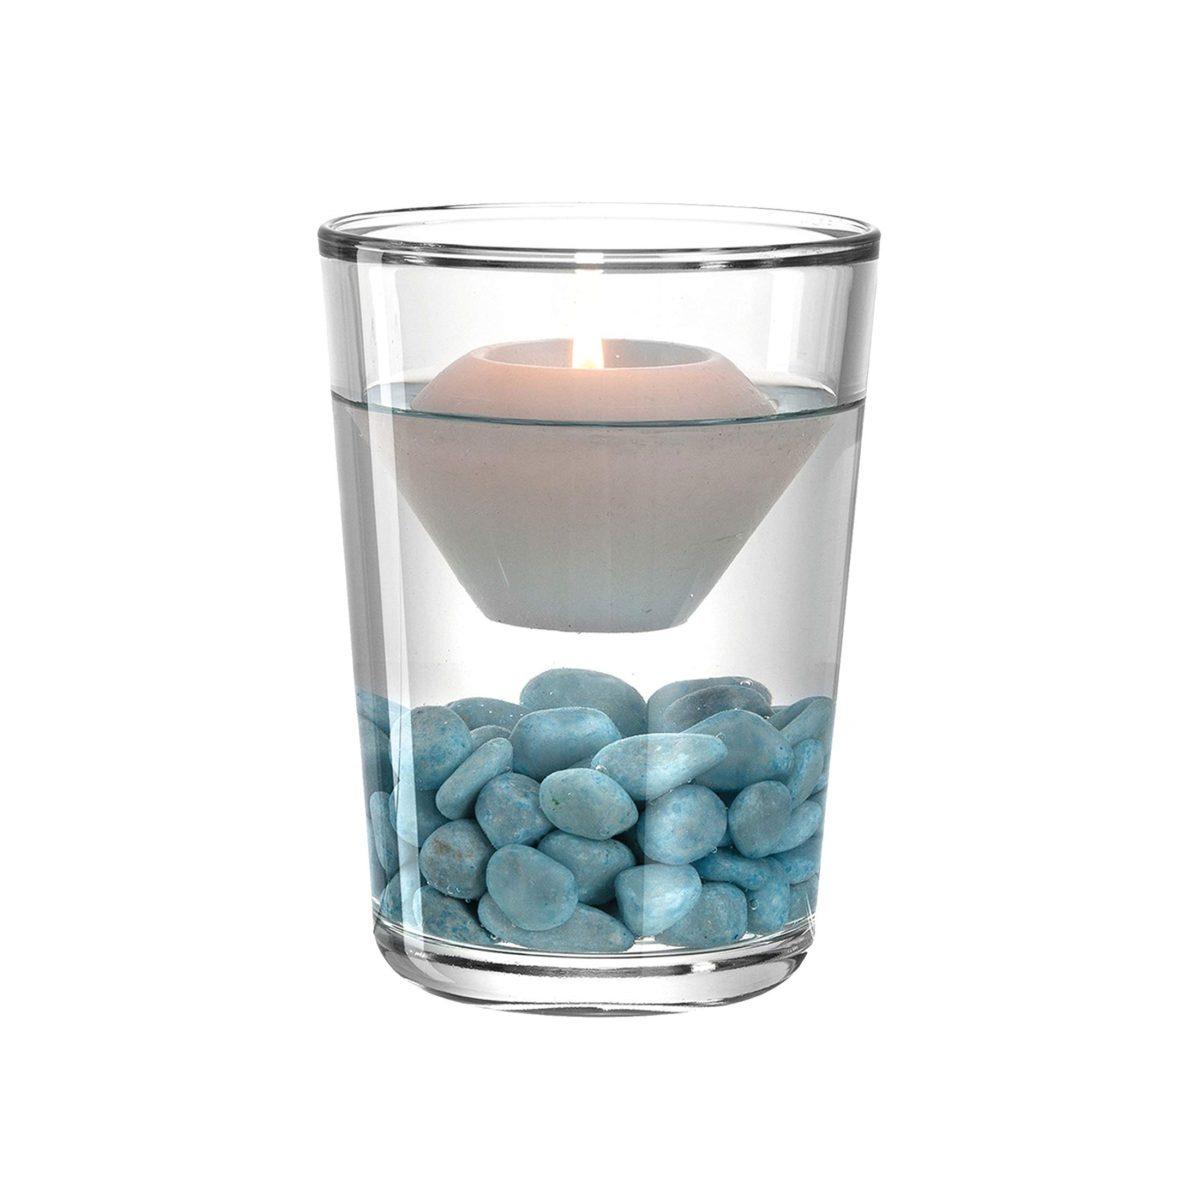 81VCjYjKOdL. AC SL1500  1200x1180 - Suport pentru lumânare Floating candle (L078365)